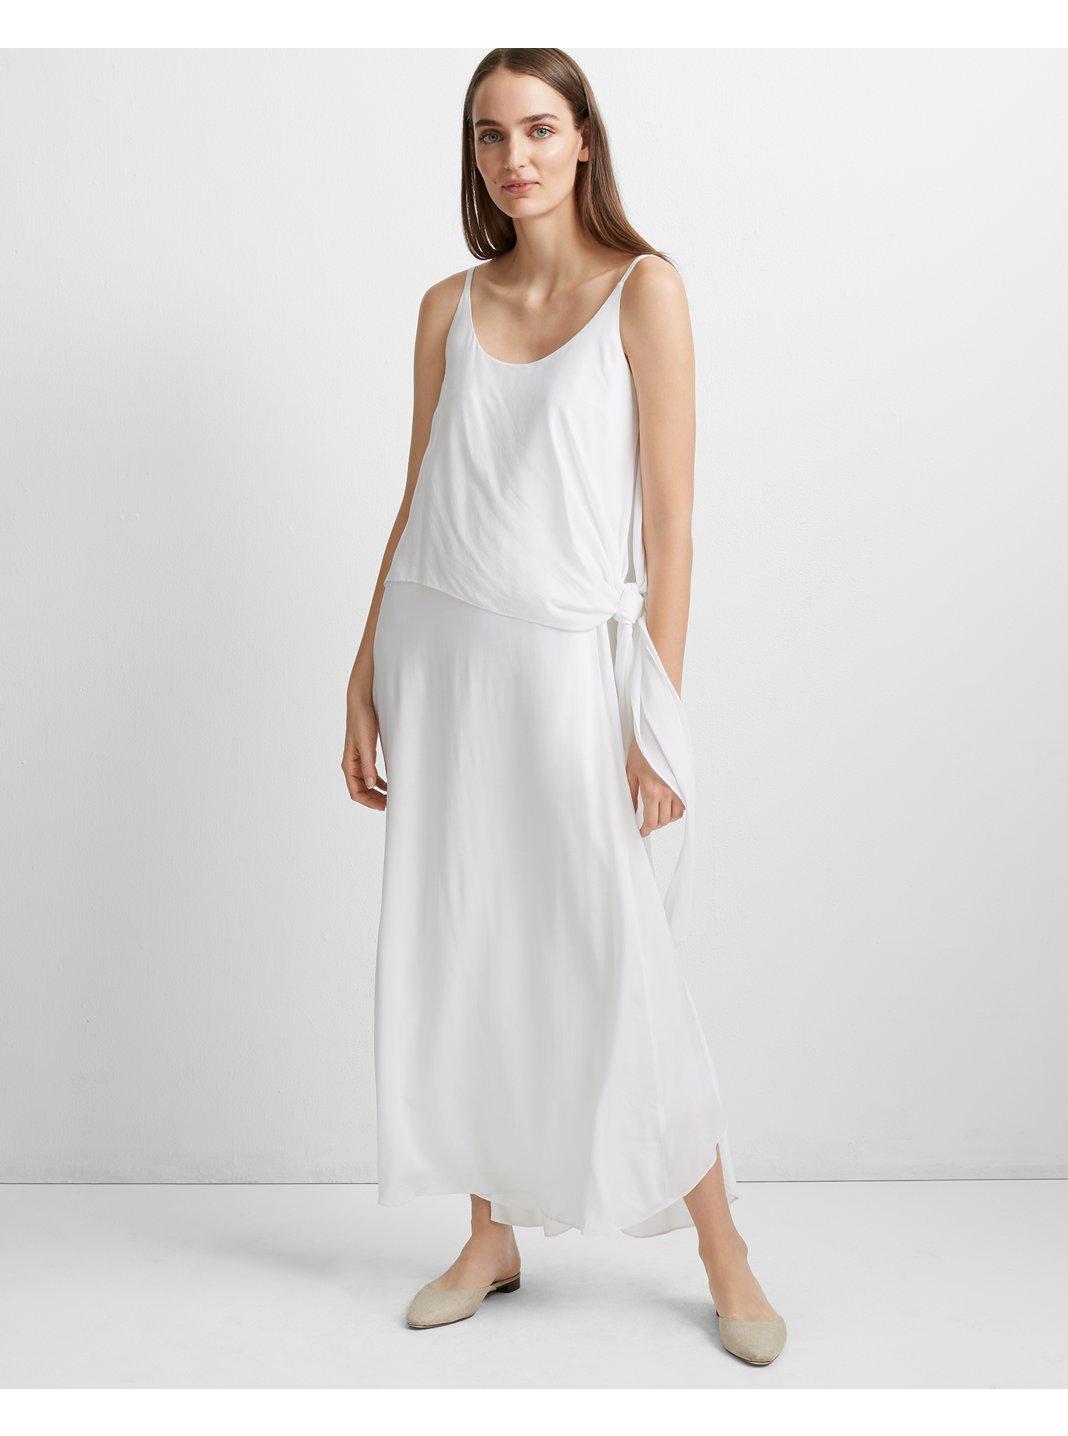 c2c78d304570 Thereeza Dress. EXTRA 30% OFF